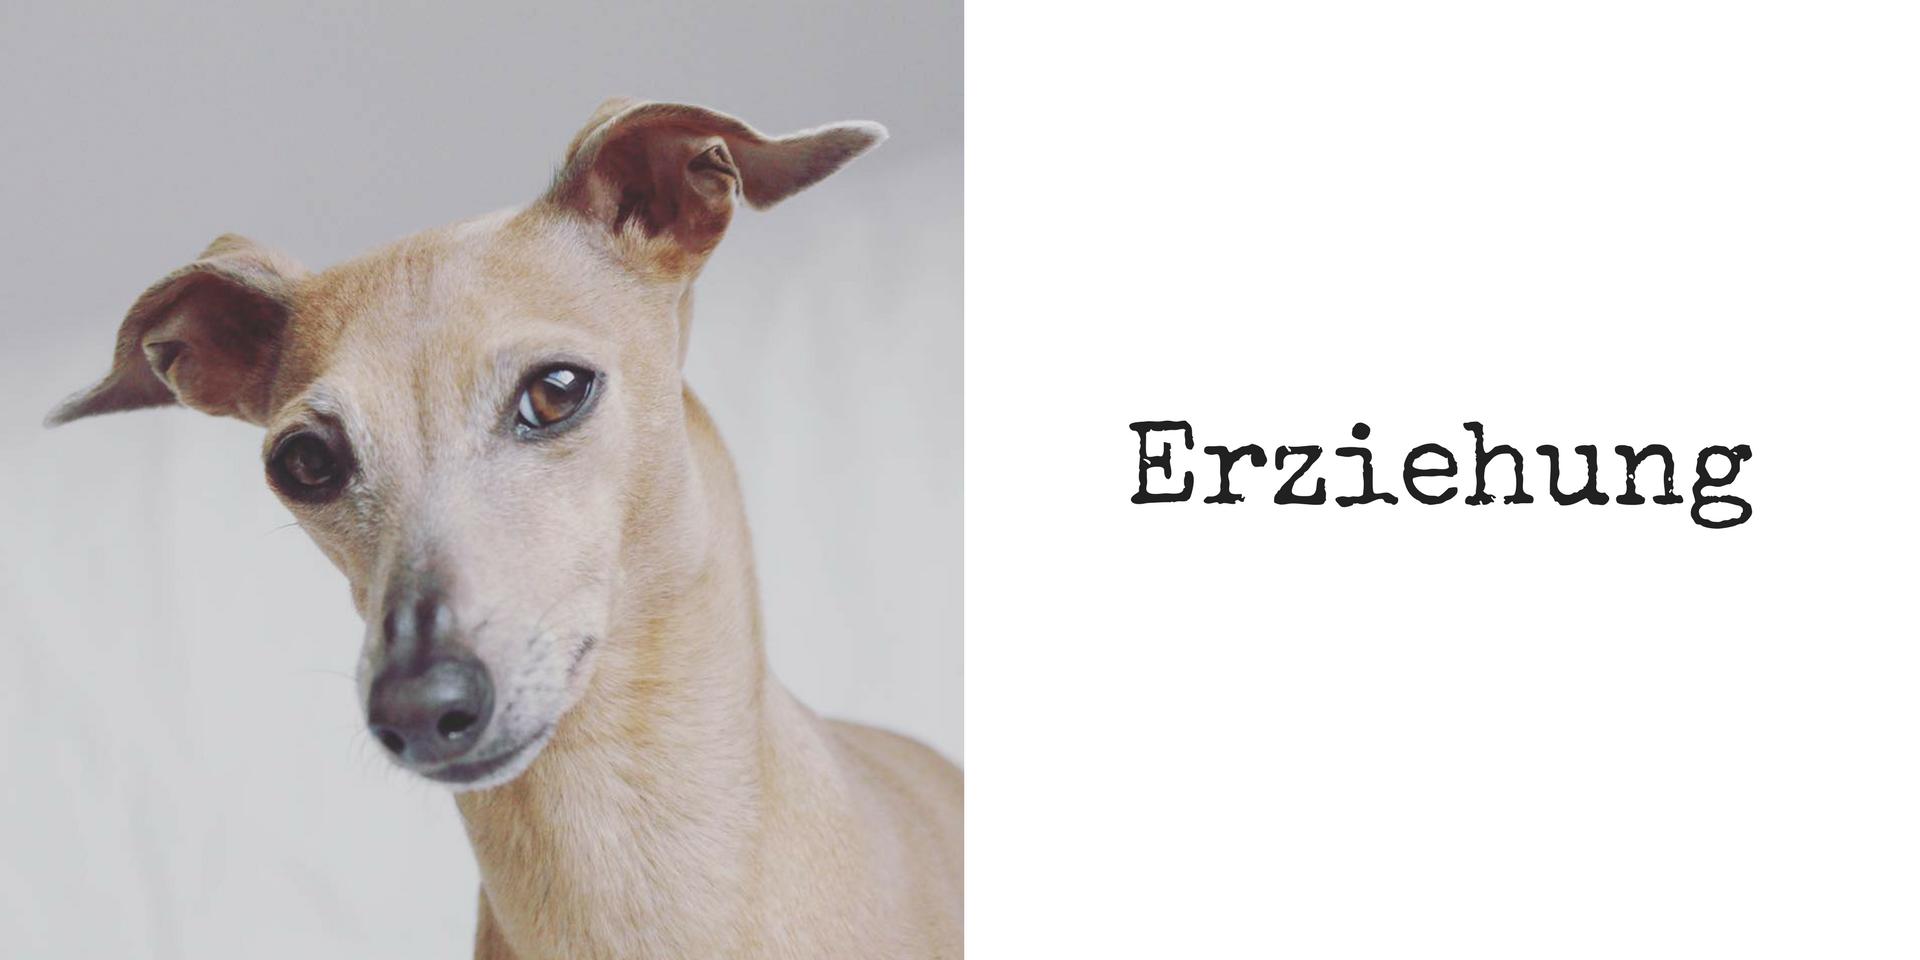 miDoggy Blog Community für Hunde Erziehung